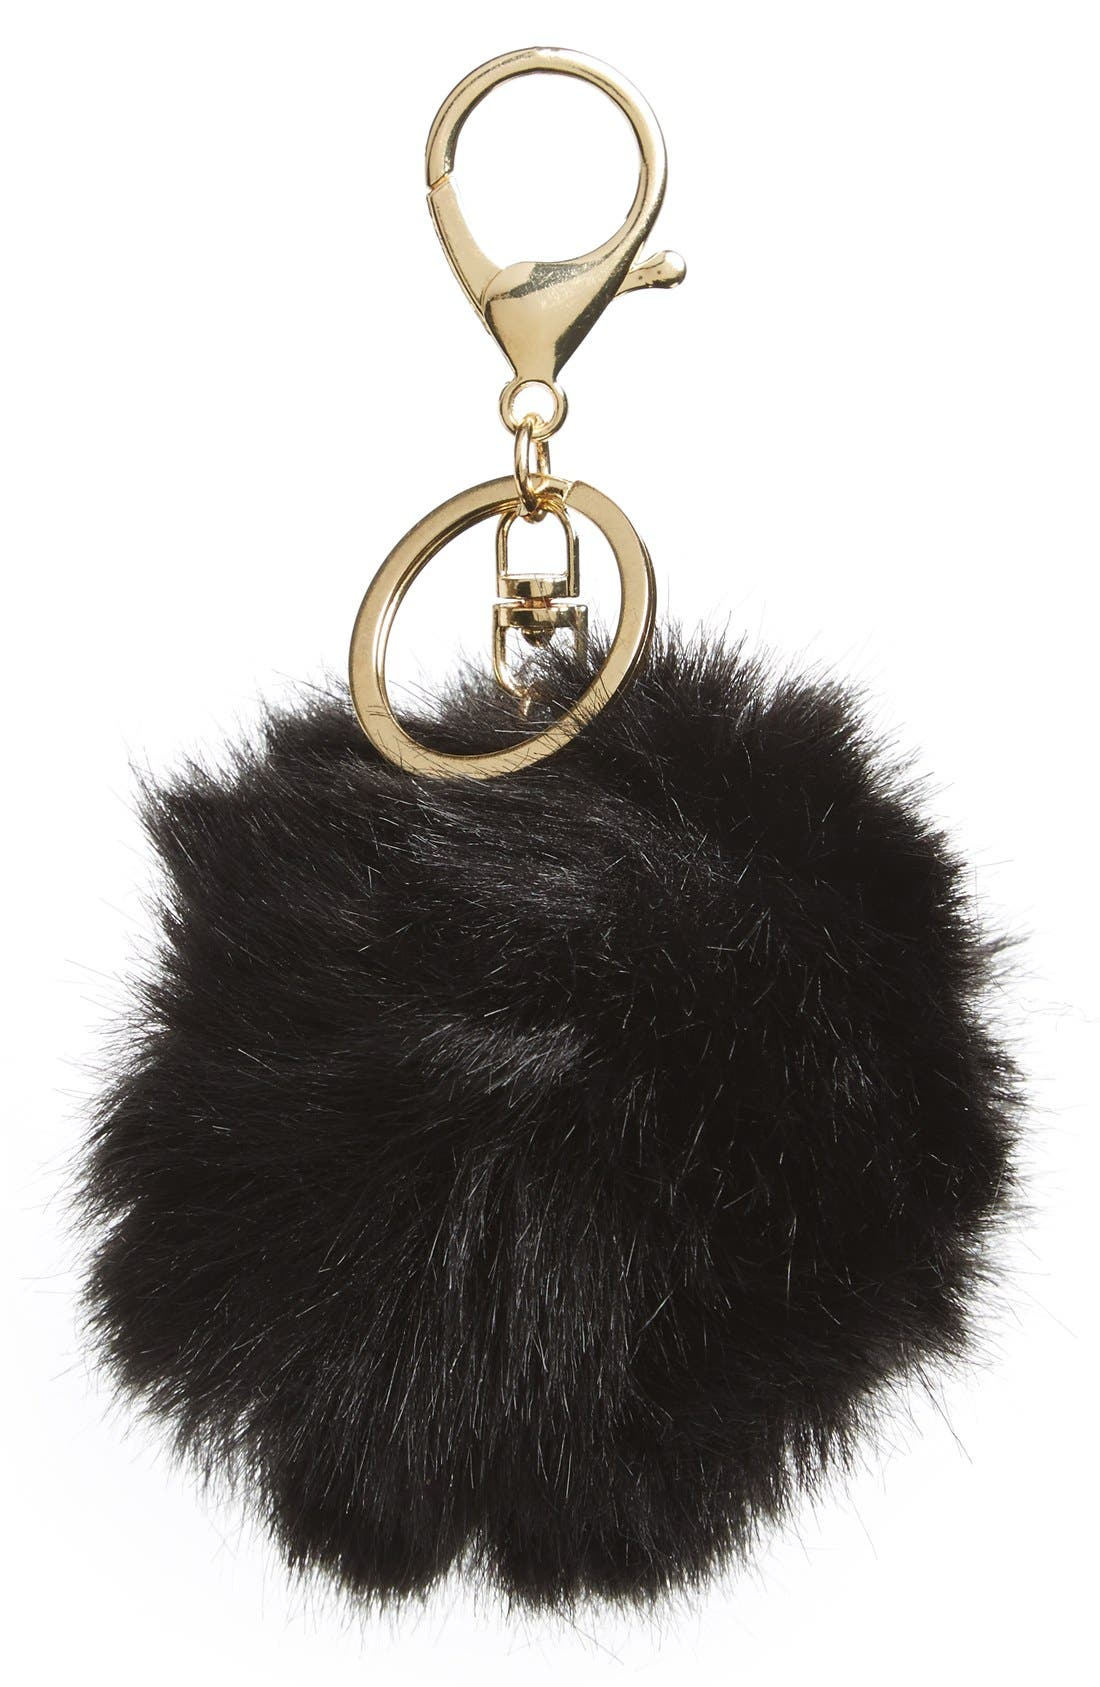 Alternate Image 1 Selected - BP. Faux Fur Pom Bag Charm